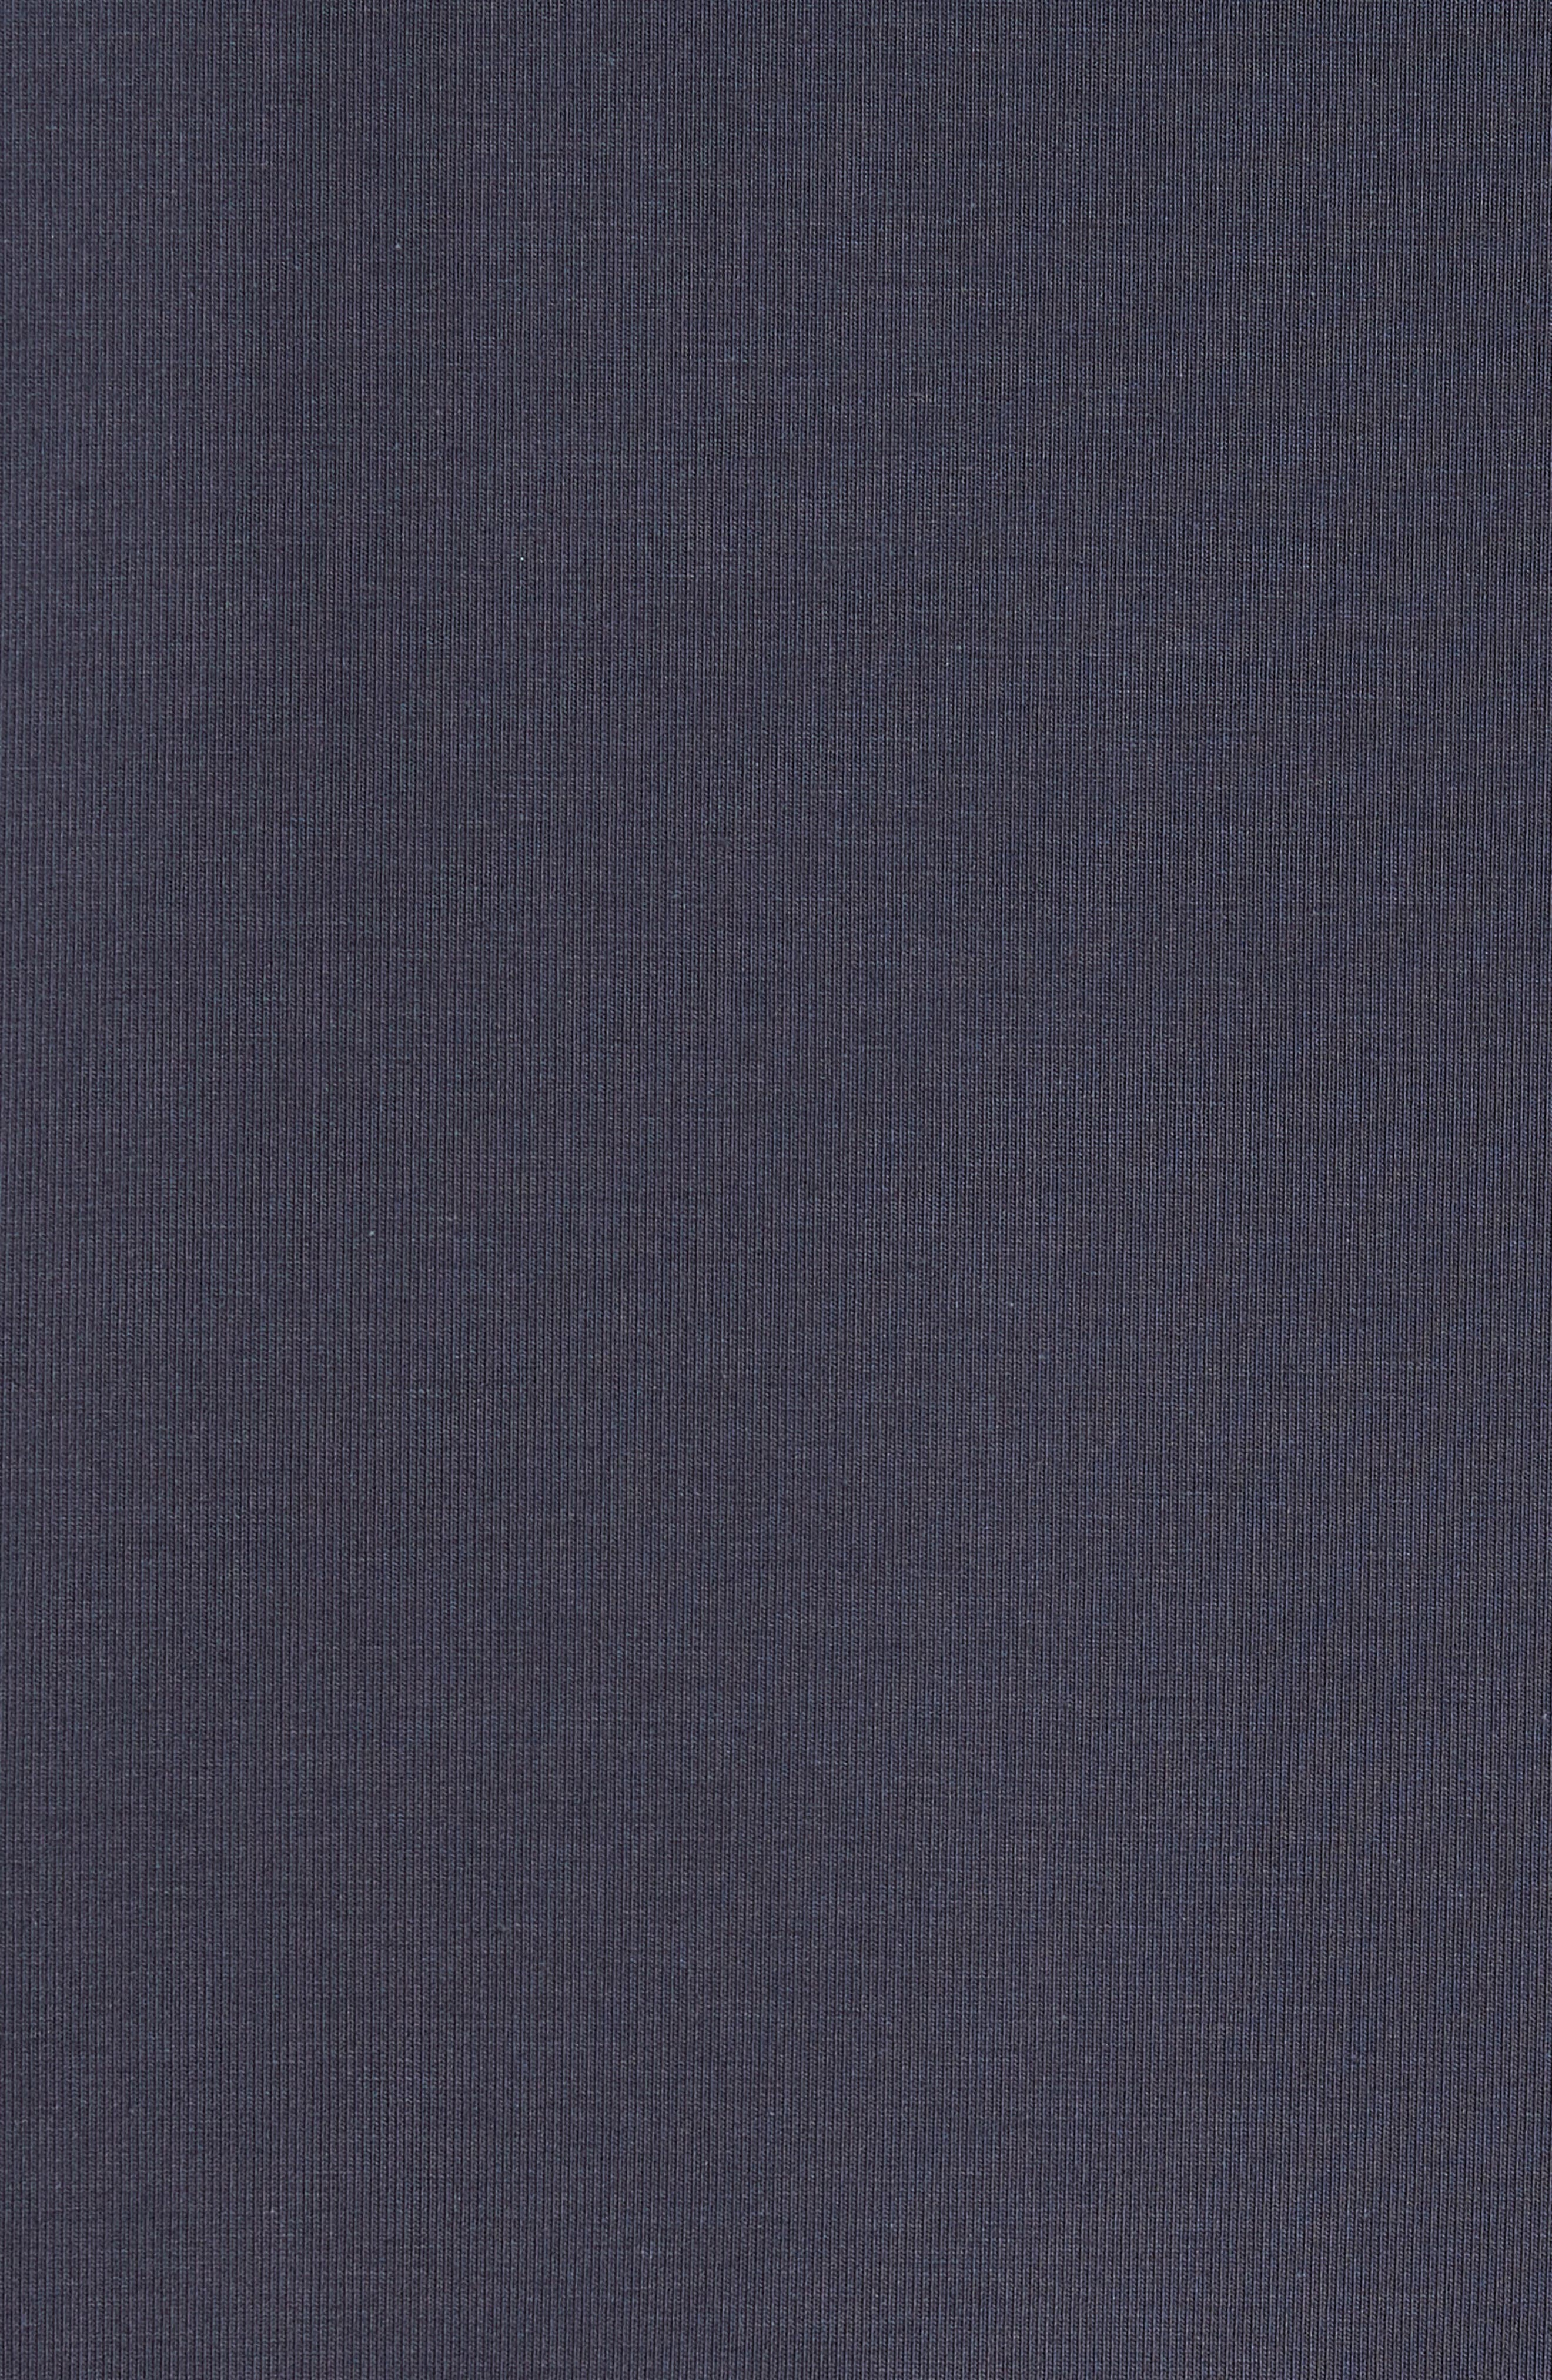 TRAVISMATHEW, 'Strange Love' Trim Fit Wrinkle Resistant Quarter Zip Jacket, Alternate thumbnail 6, color, BLUE NIGHTS